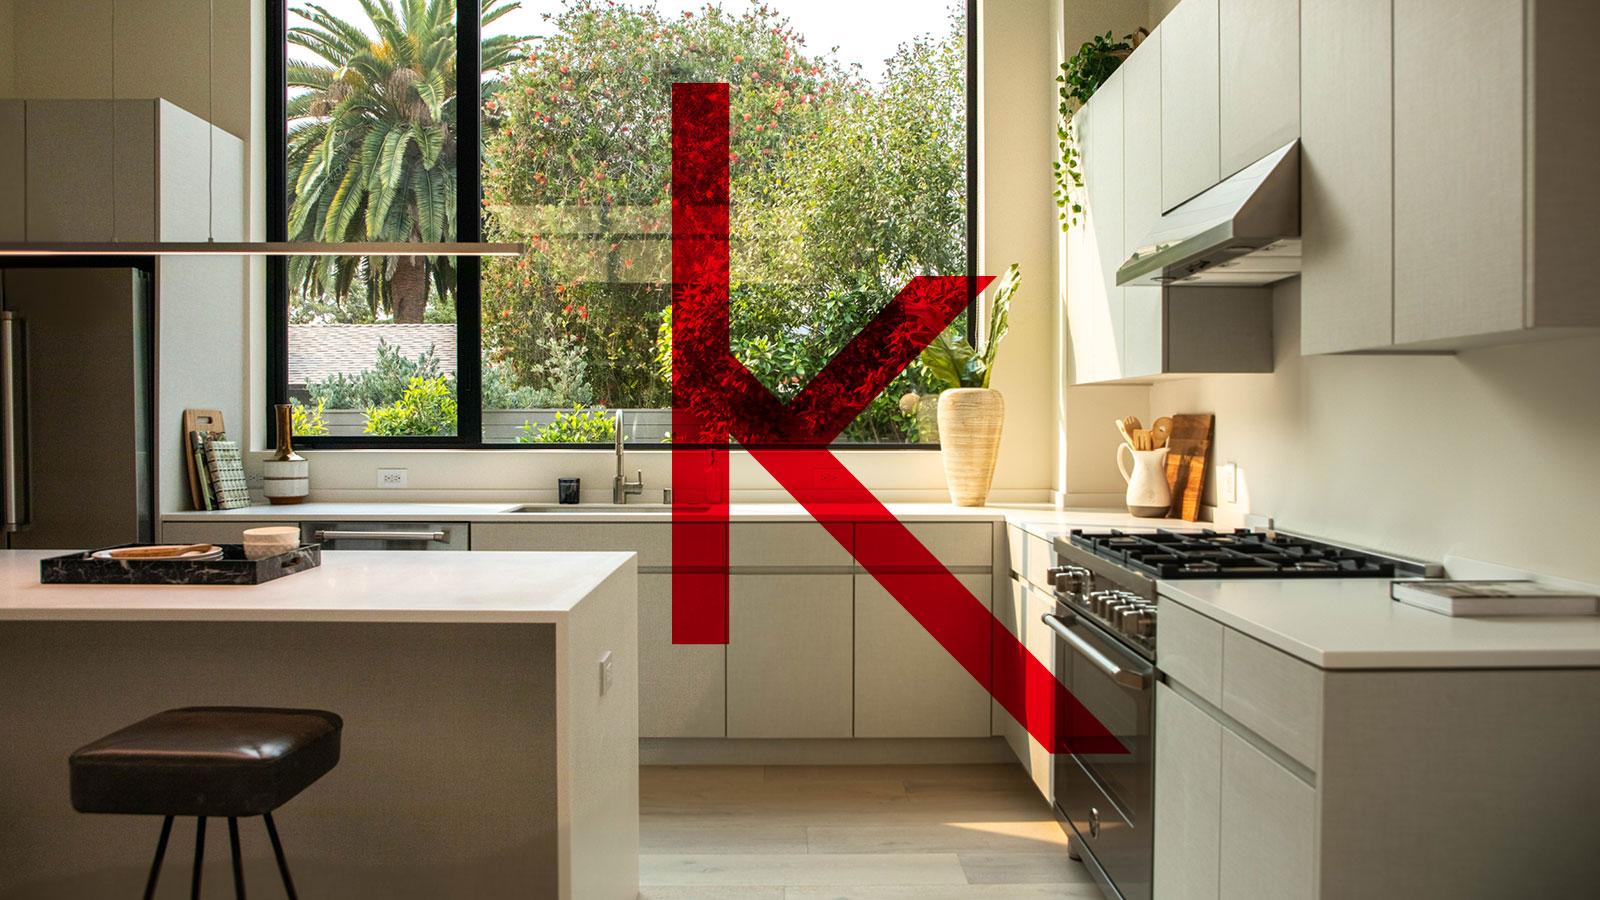 property-agency-visual-branding-identity-design-milton-keynes-london-2